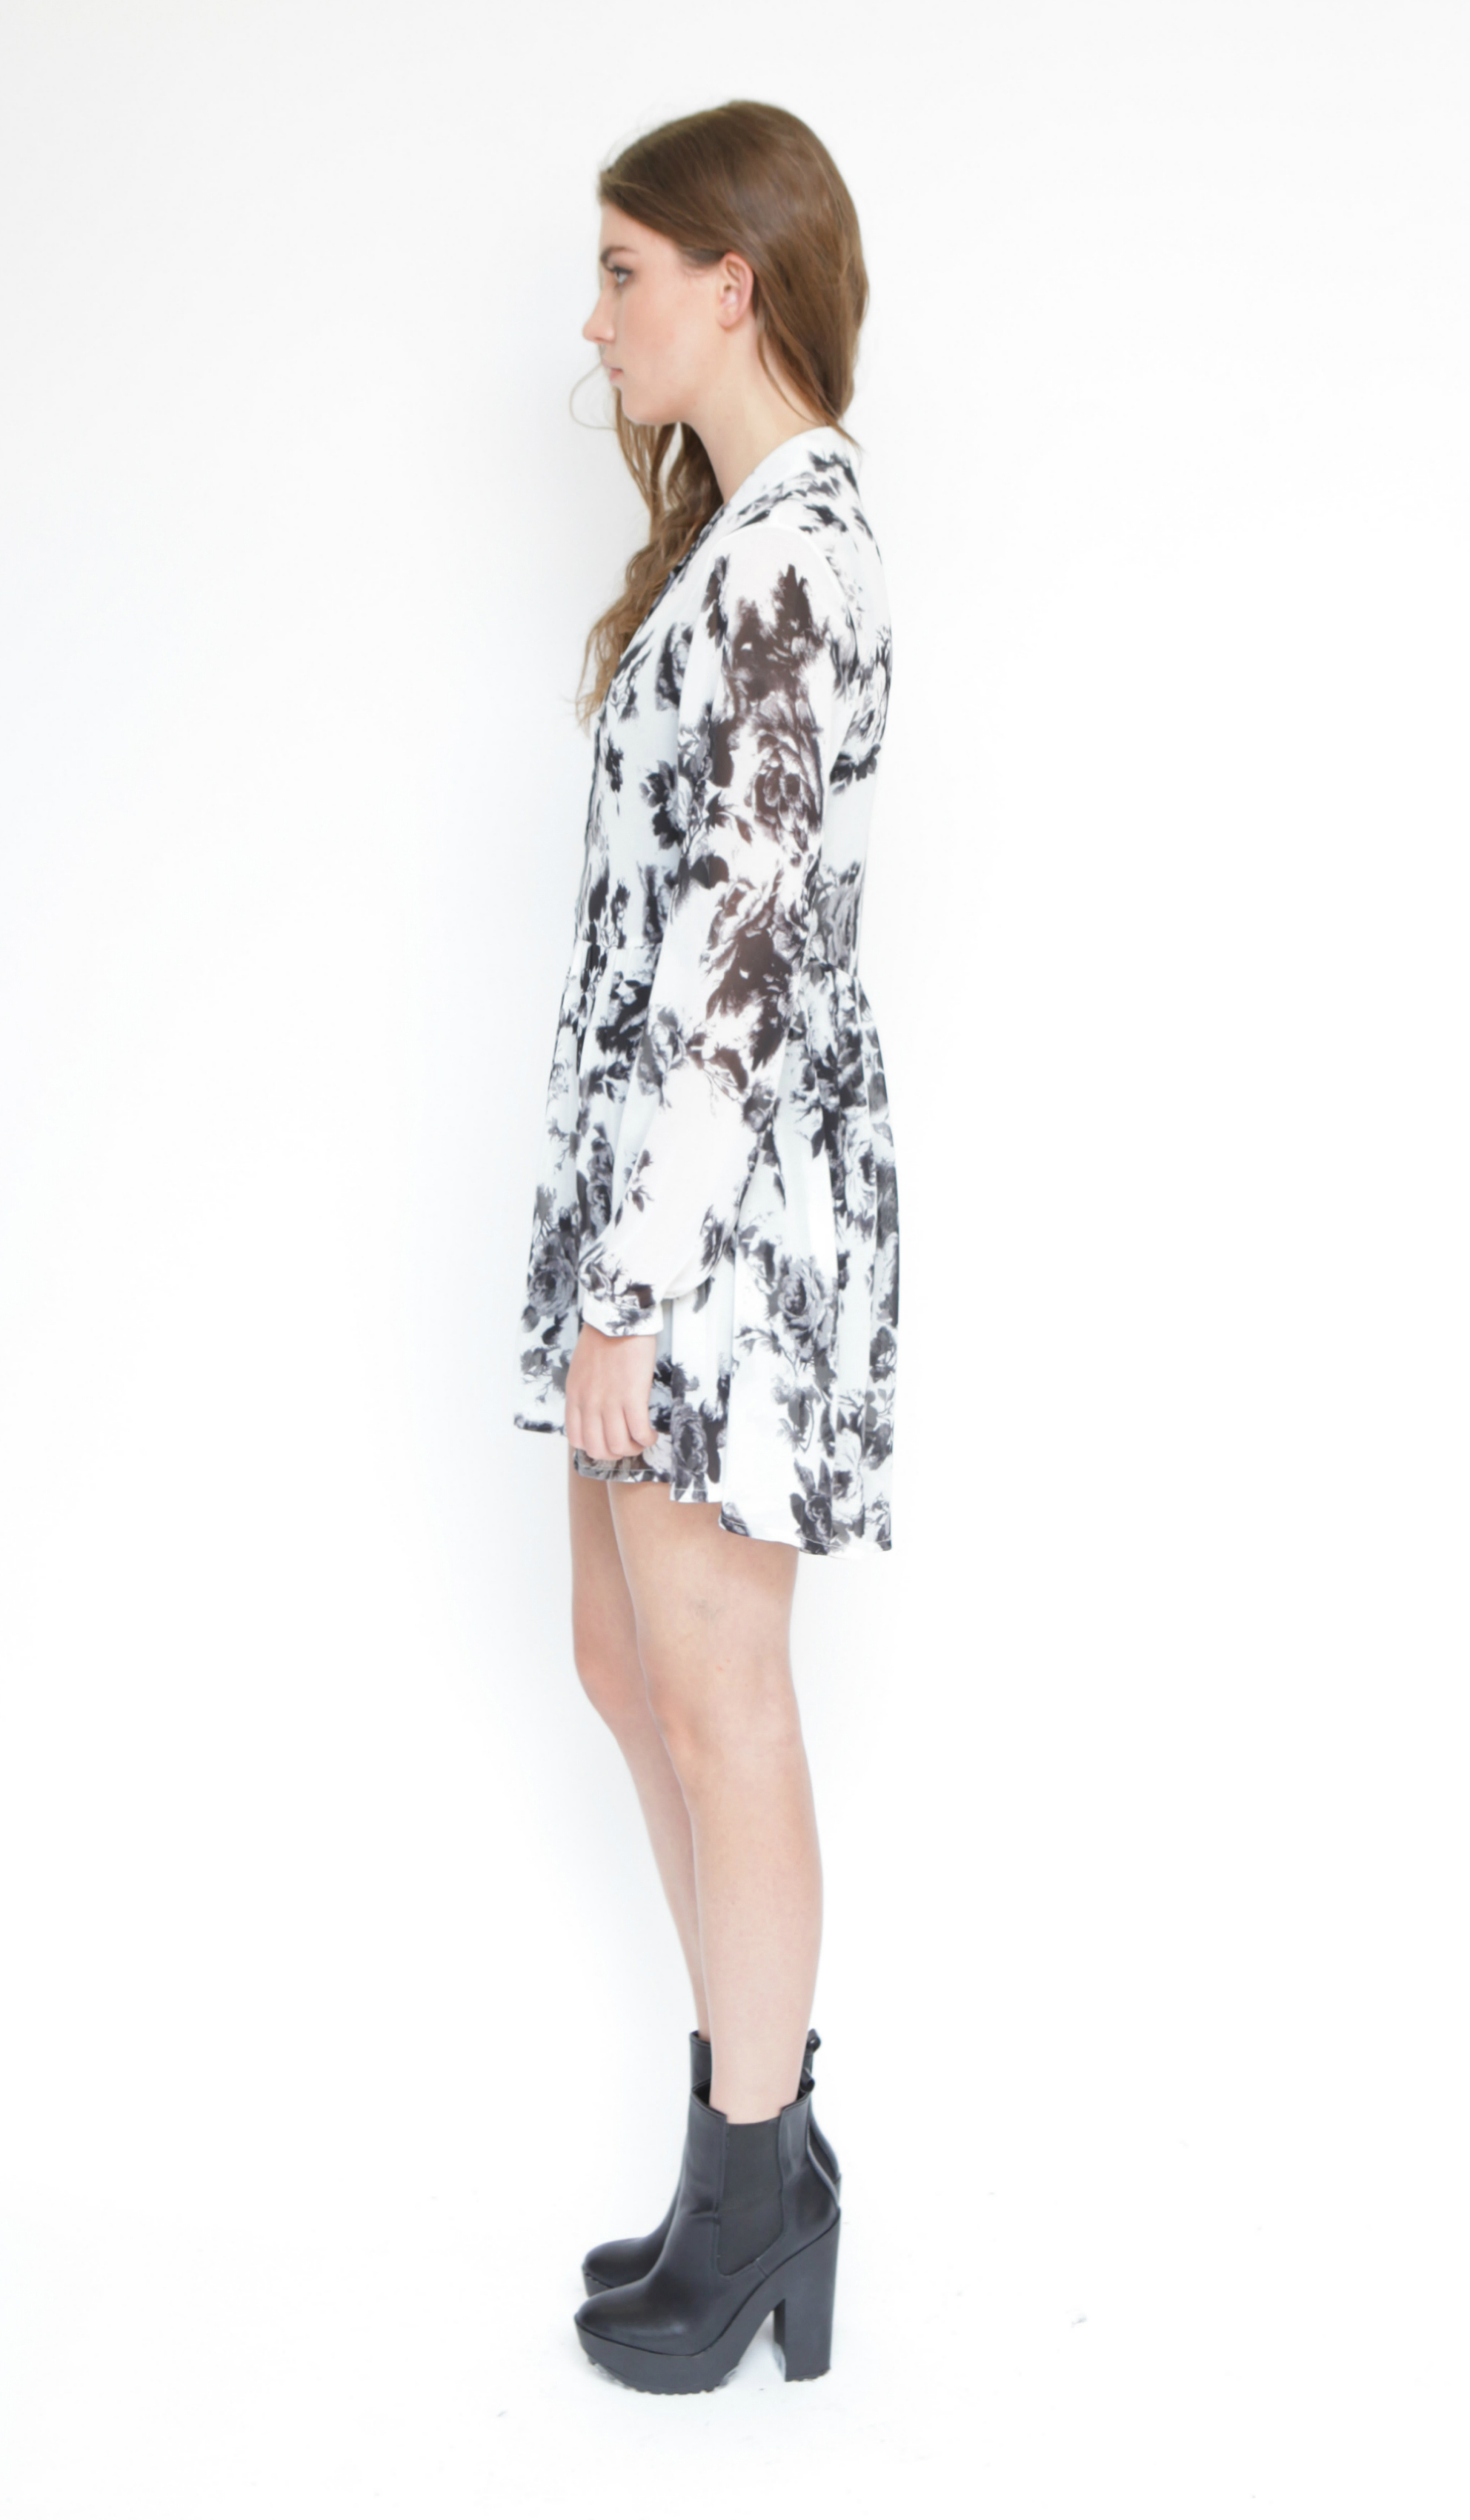 Black and ivory rose print chiffon shirt dress